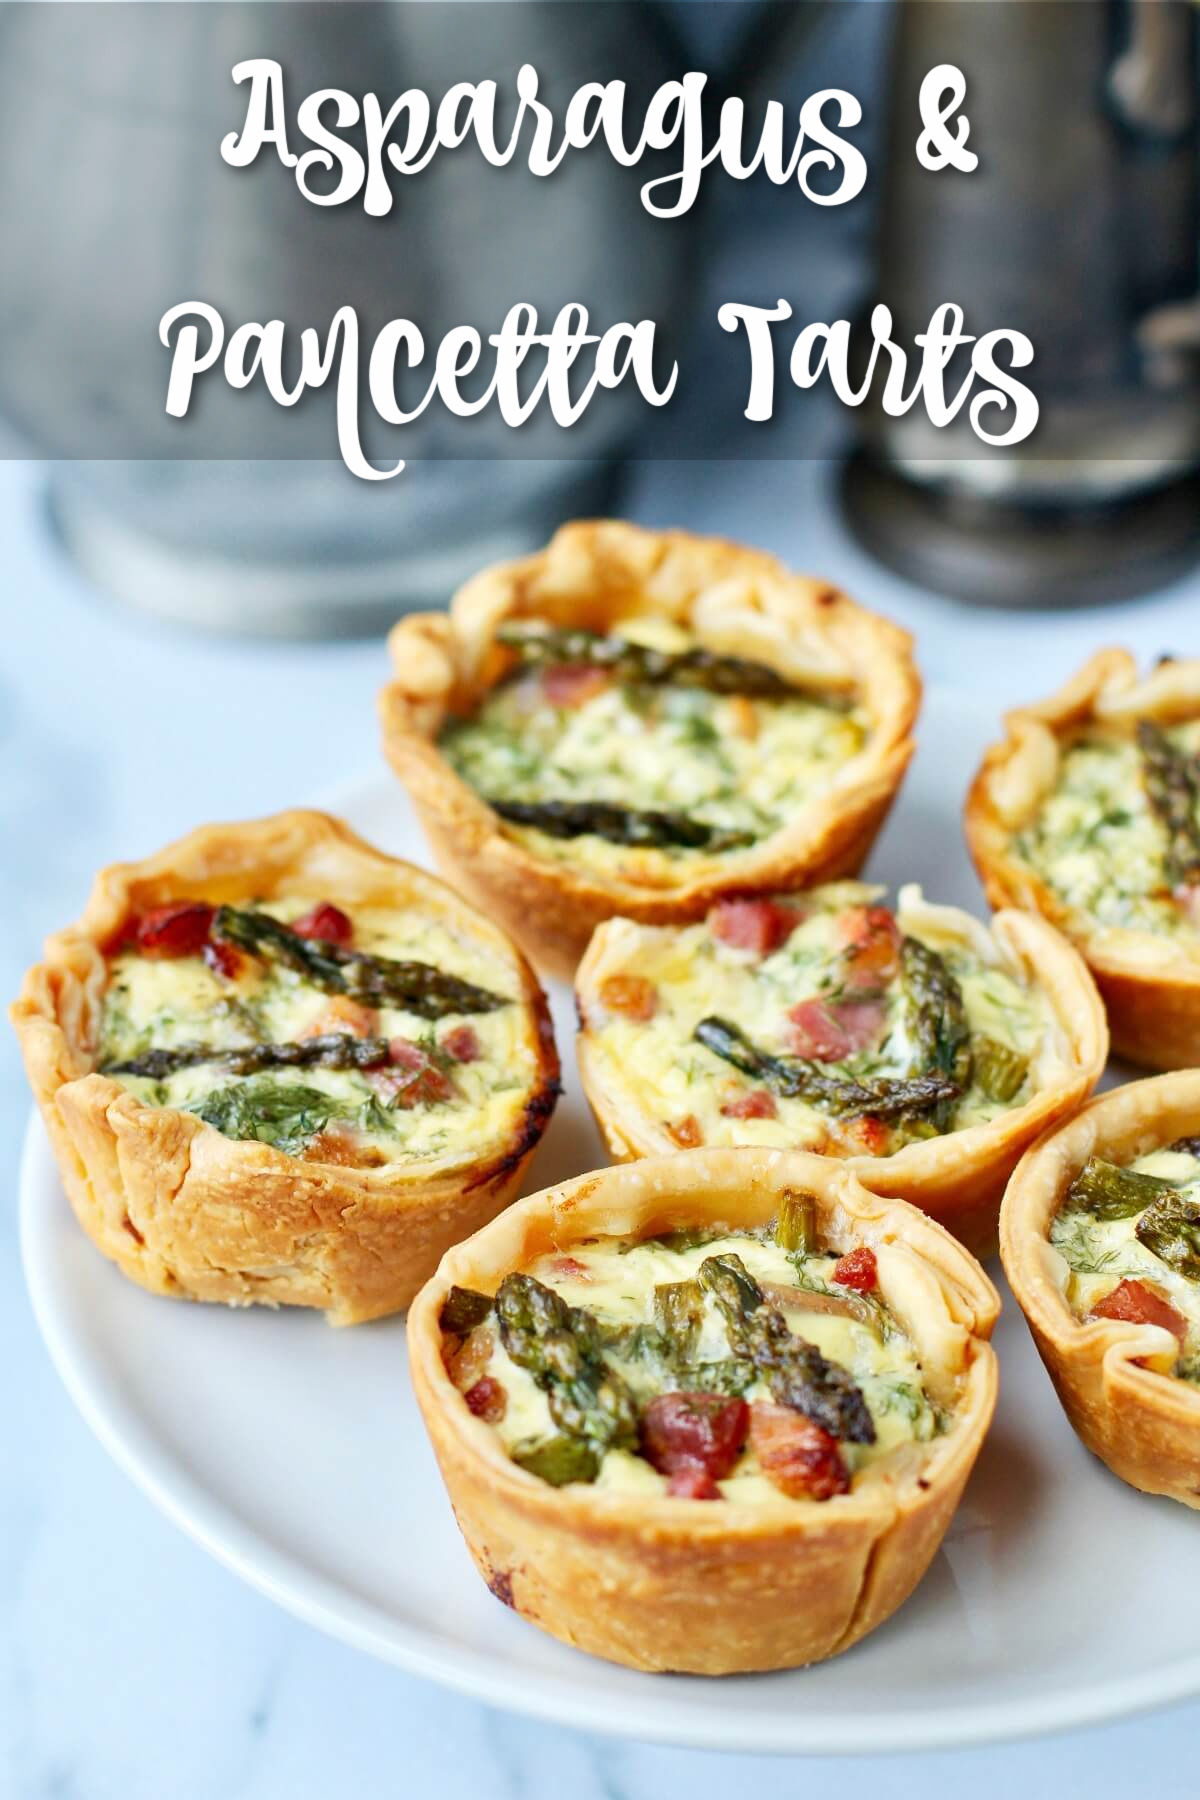 Pancetta and Asparagus Tart appetizers